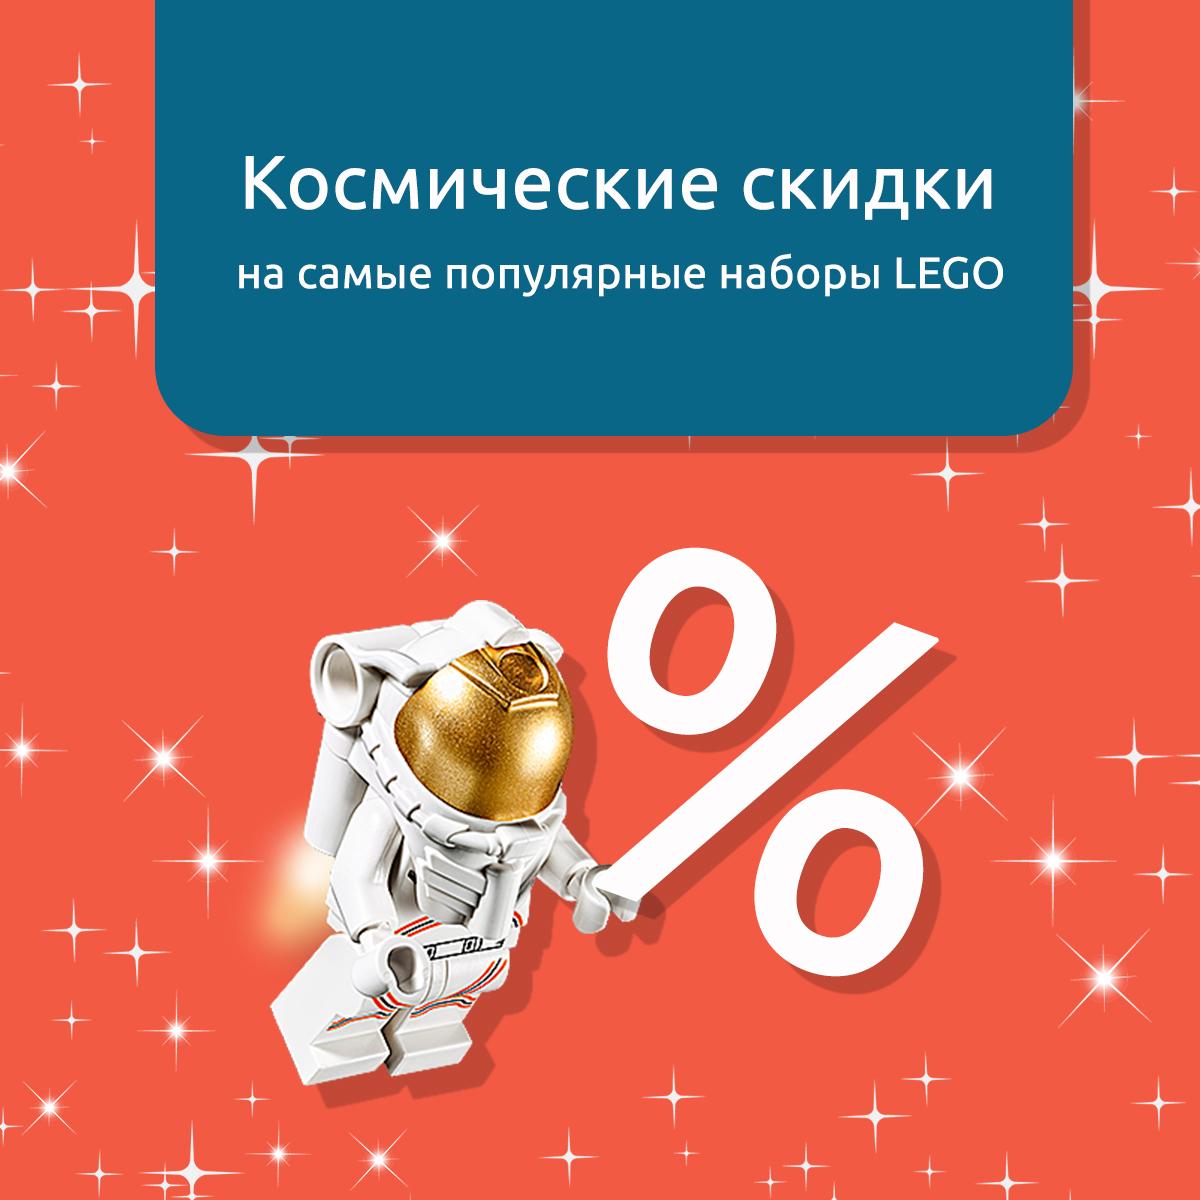 LEGO скидки